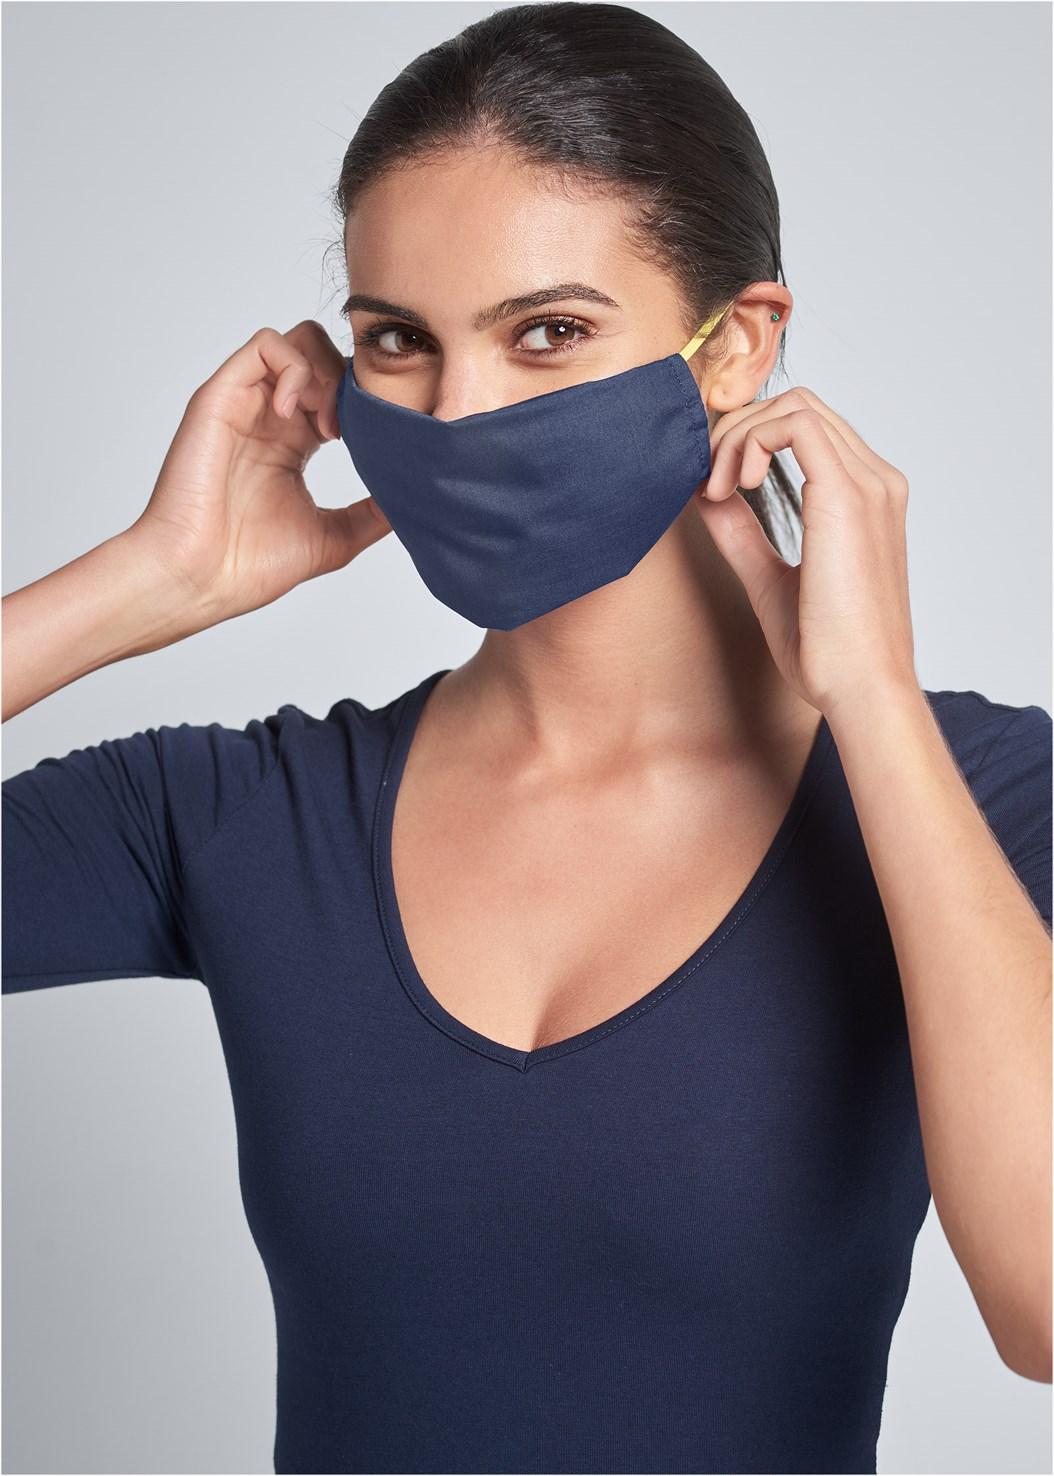 Face Mask,Long And Lean Tee,Cut Off Jean Shorts,Denim Handbag